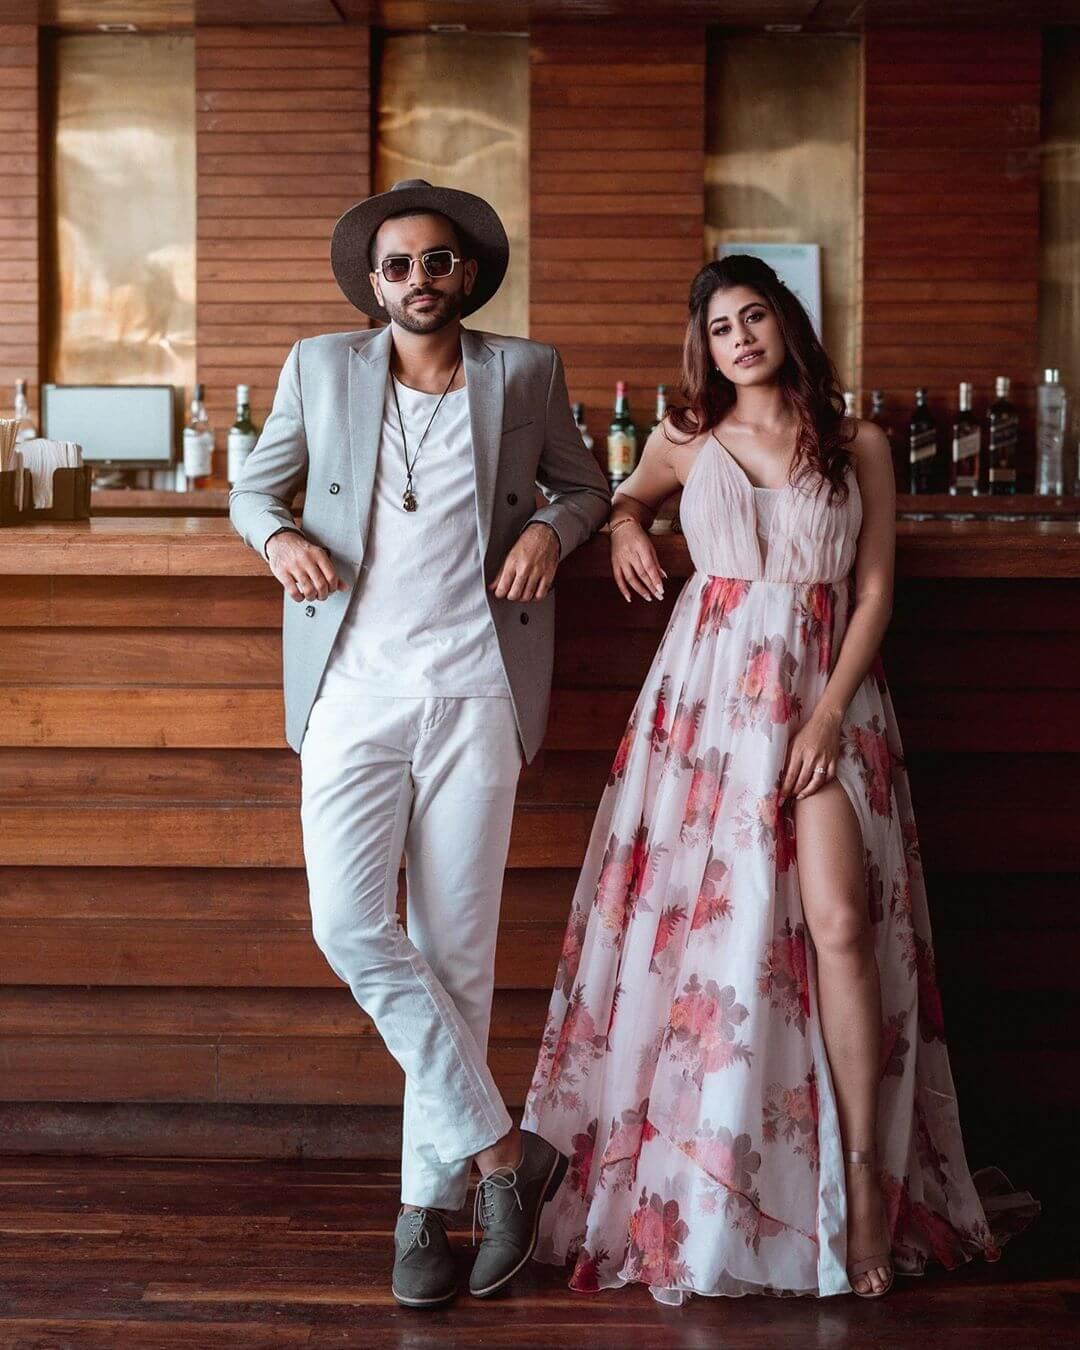 Malvika Sitlani The Popular Beauty Blogger-Actor Ties The Knot With Akhil Aryan!